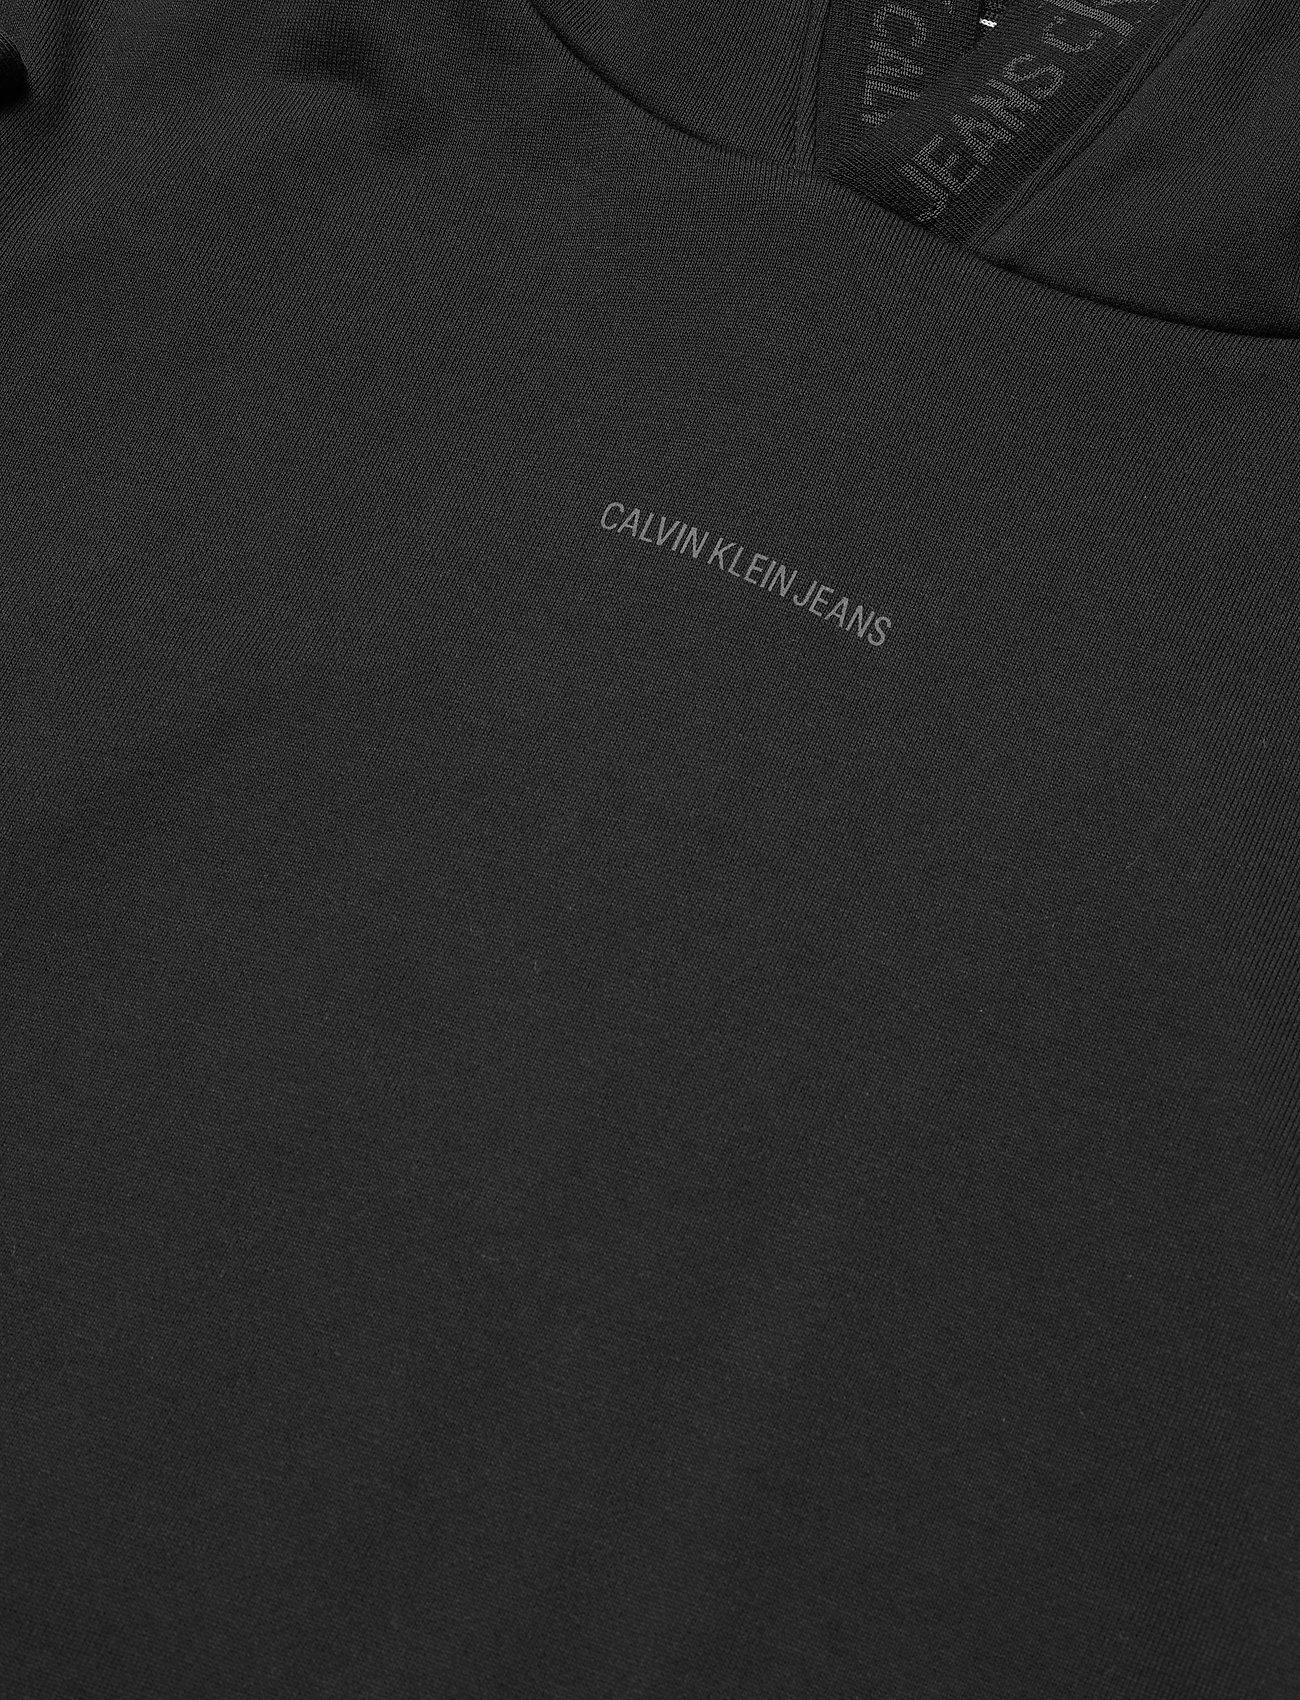 Calvin Klein Jeans - LOGO JACQUARD HOODIE - sweats à capuche - ck black - 2